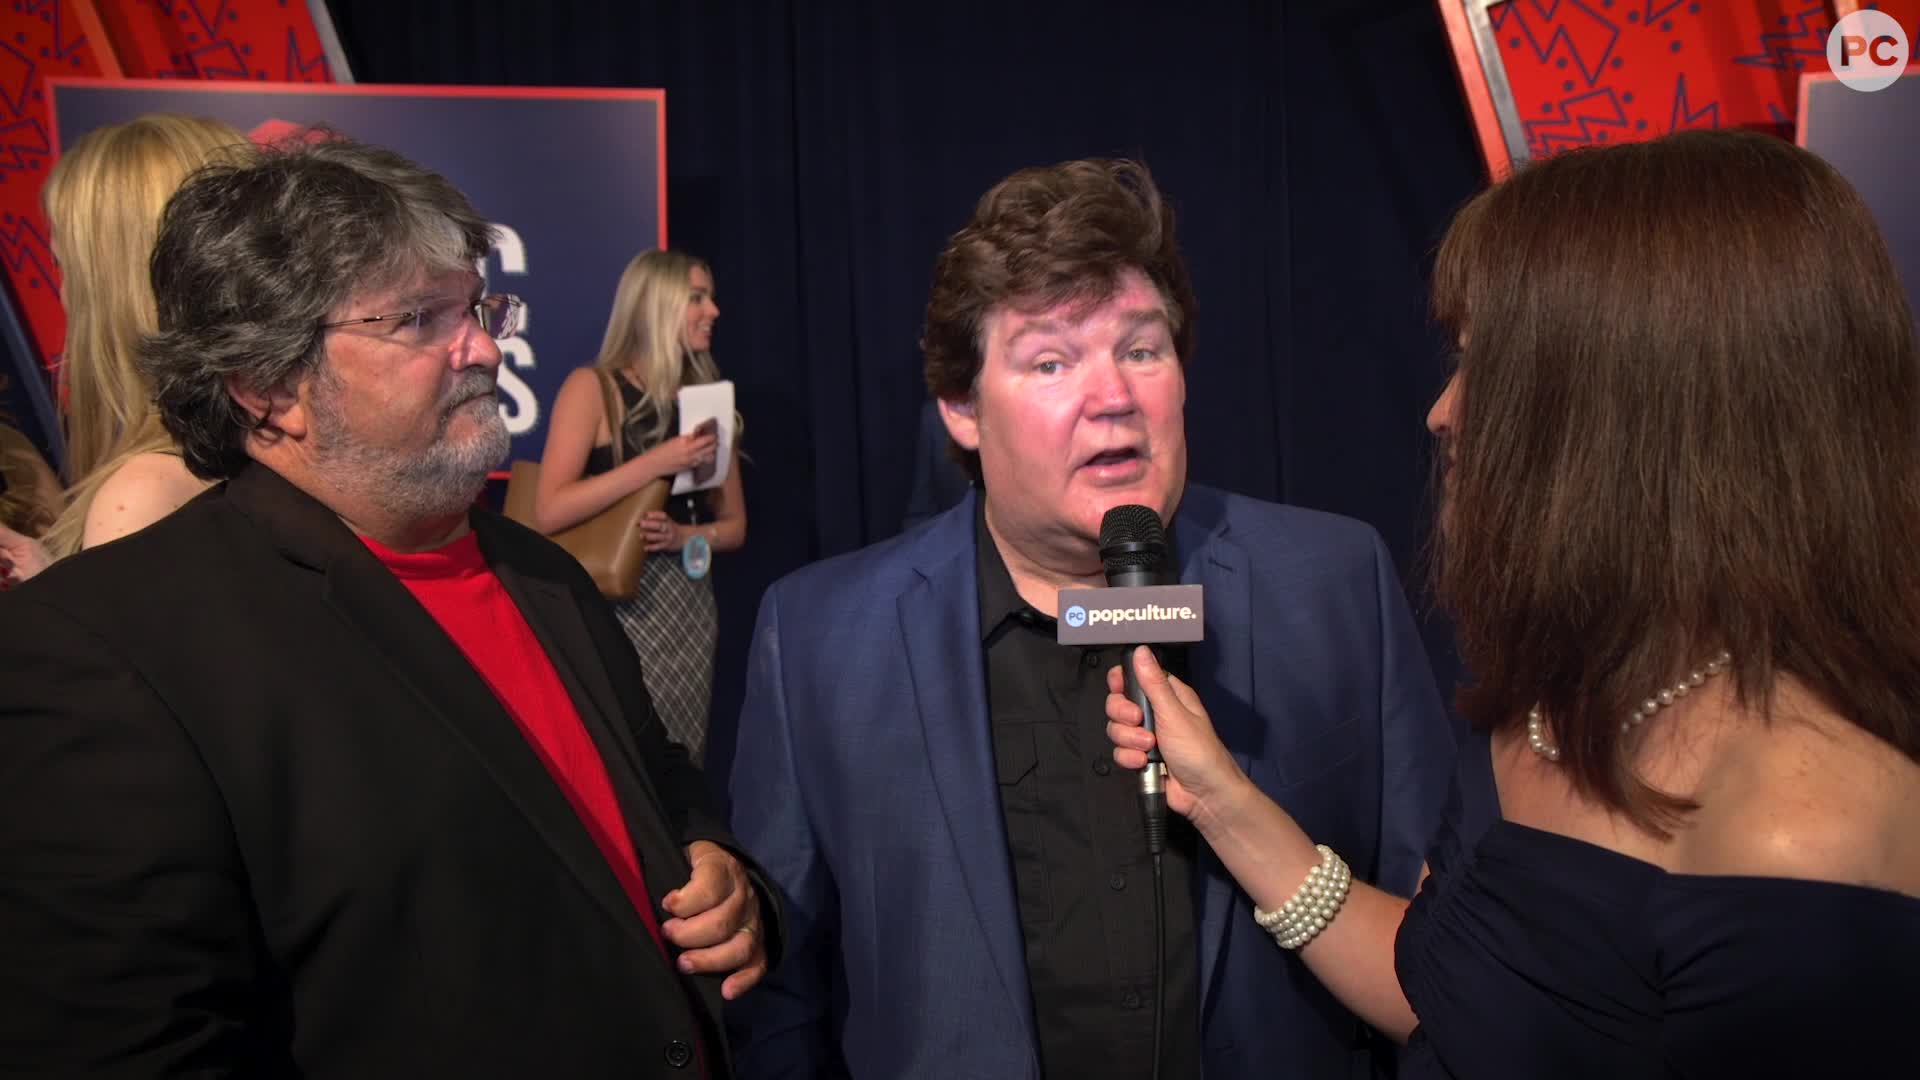 Shenandoah - 2019 CMT Awards Red Carpet Exclusive screen capture